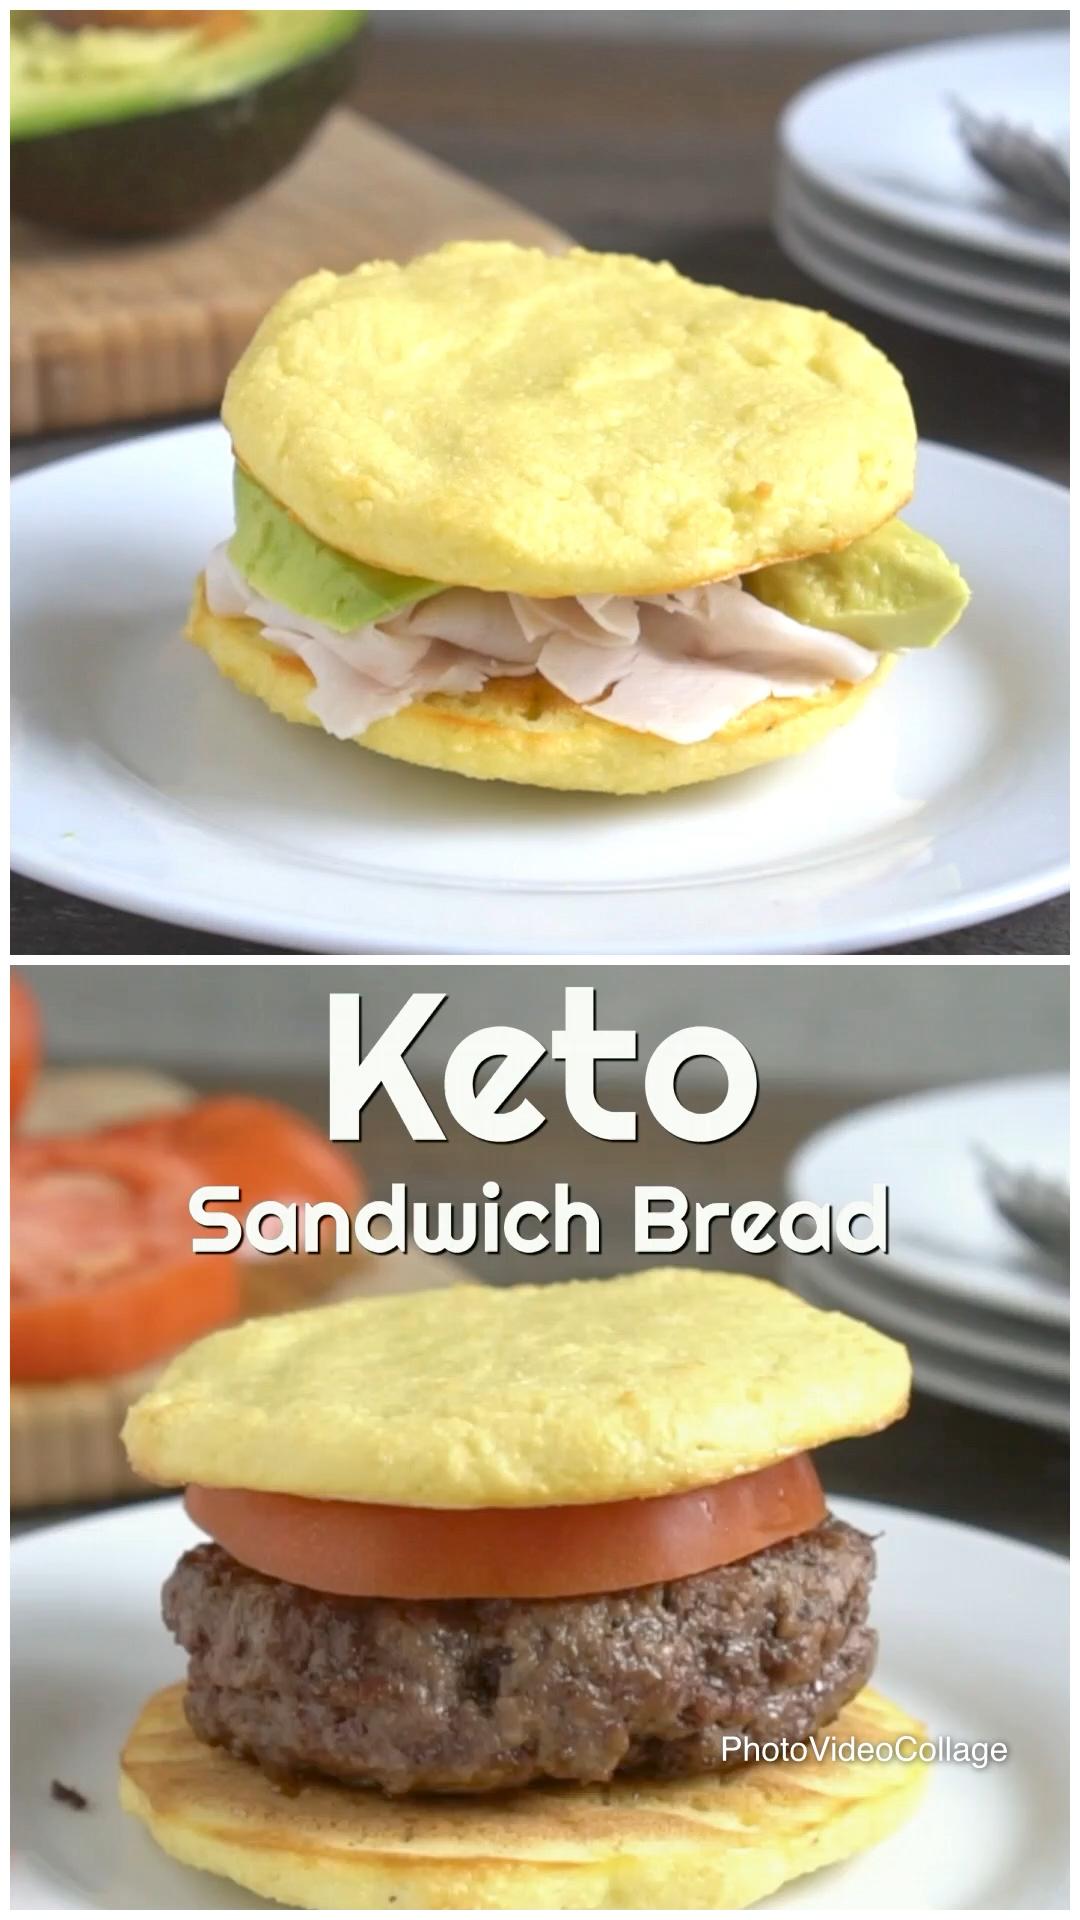 Photo of Keto Sandwich Bread